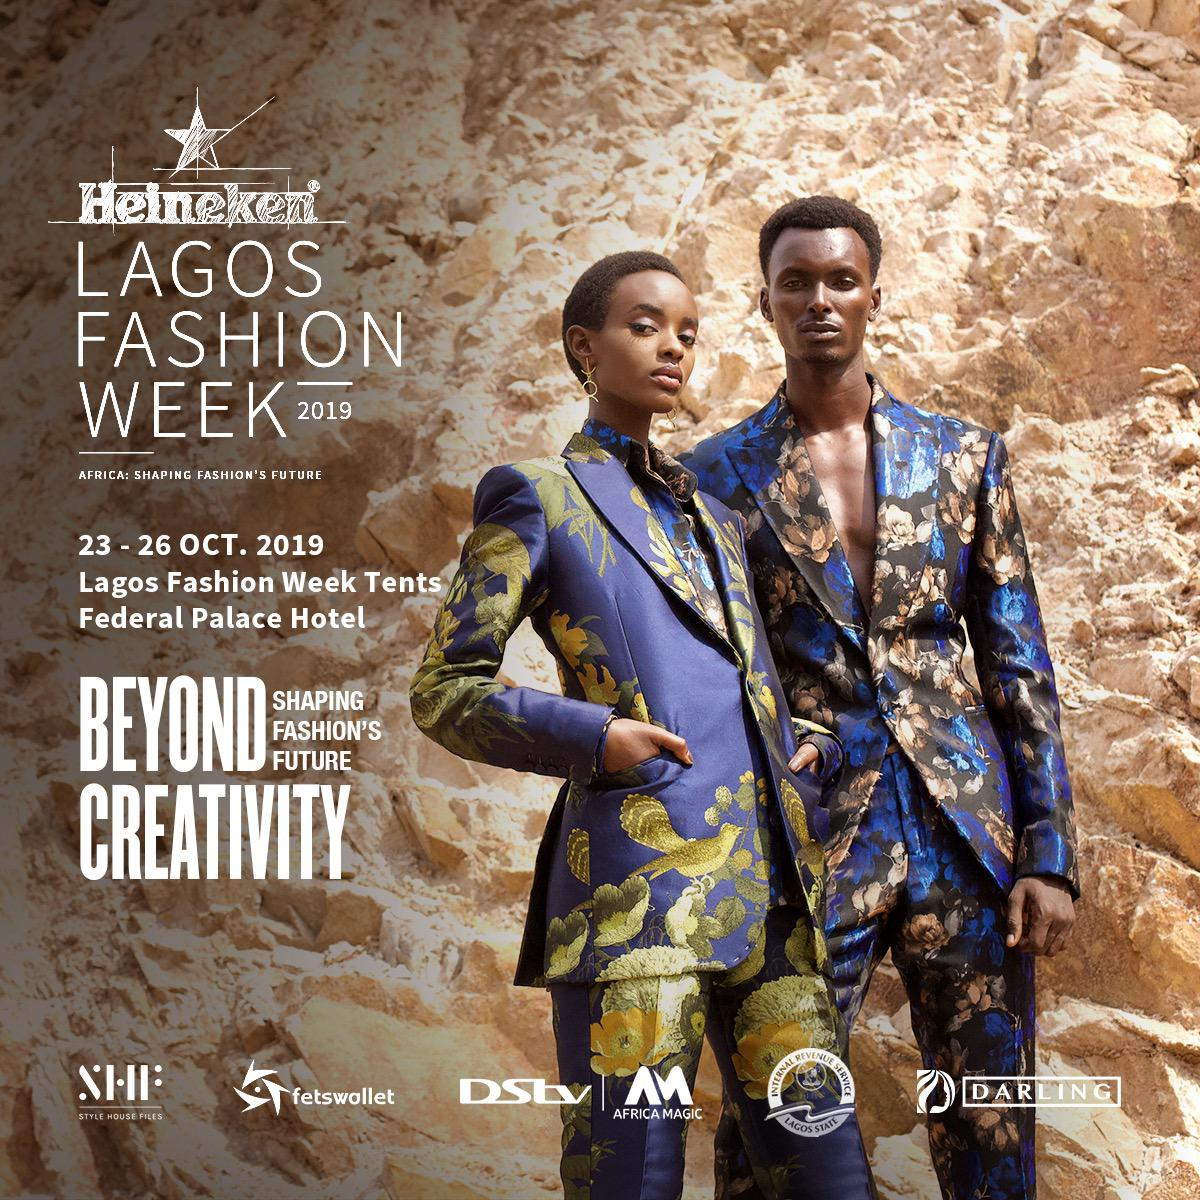 get-ready-for-heineken-lagos-fashion-week-2019-23rd-26th-october